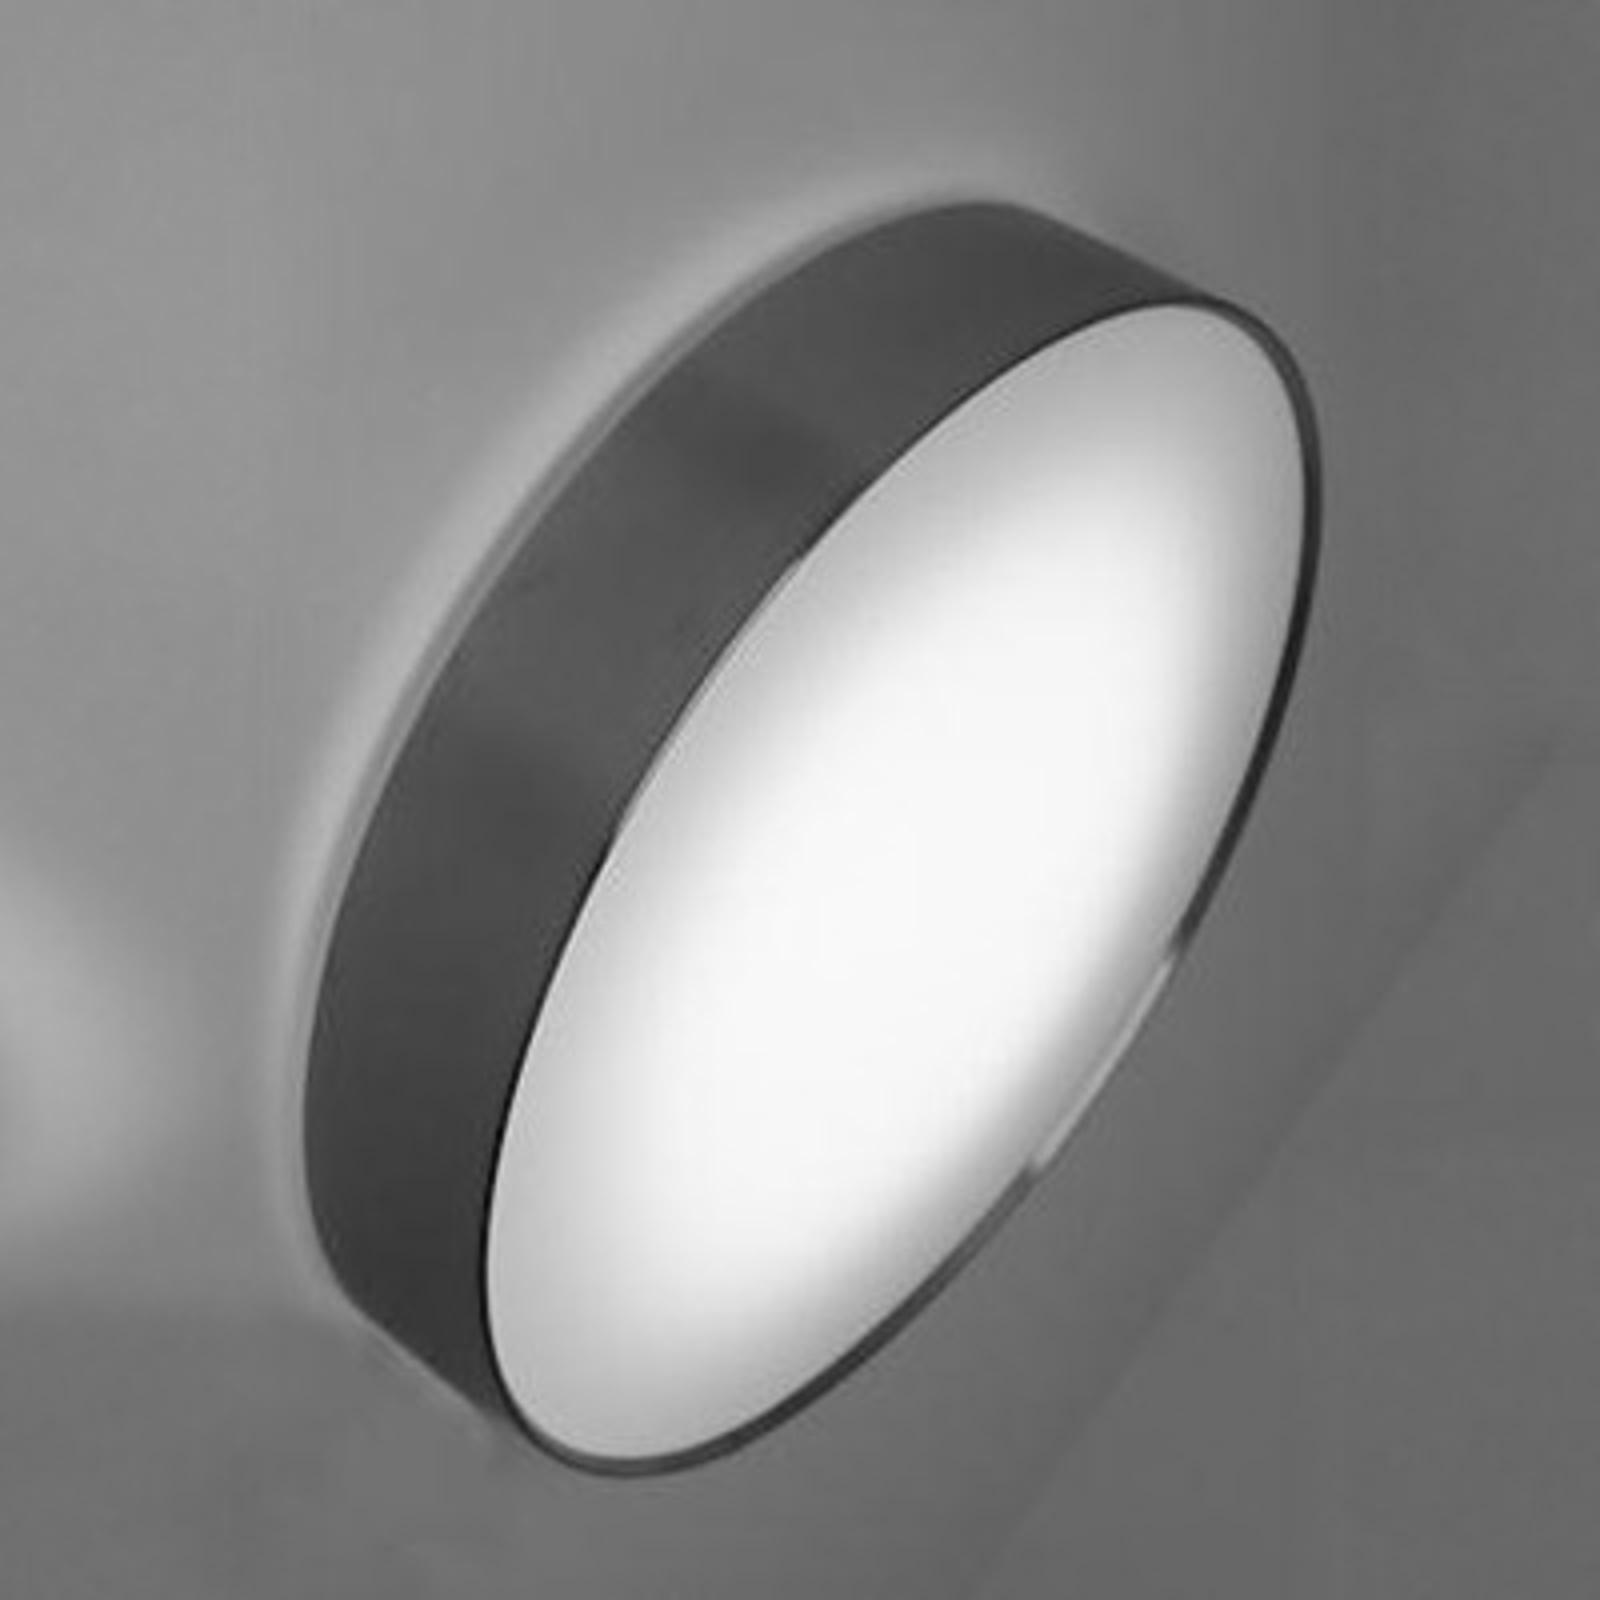 Lampe LED en inox à capteur SUN 4, 13 W